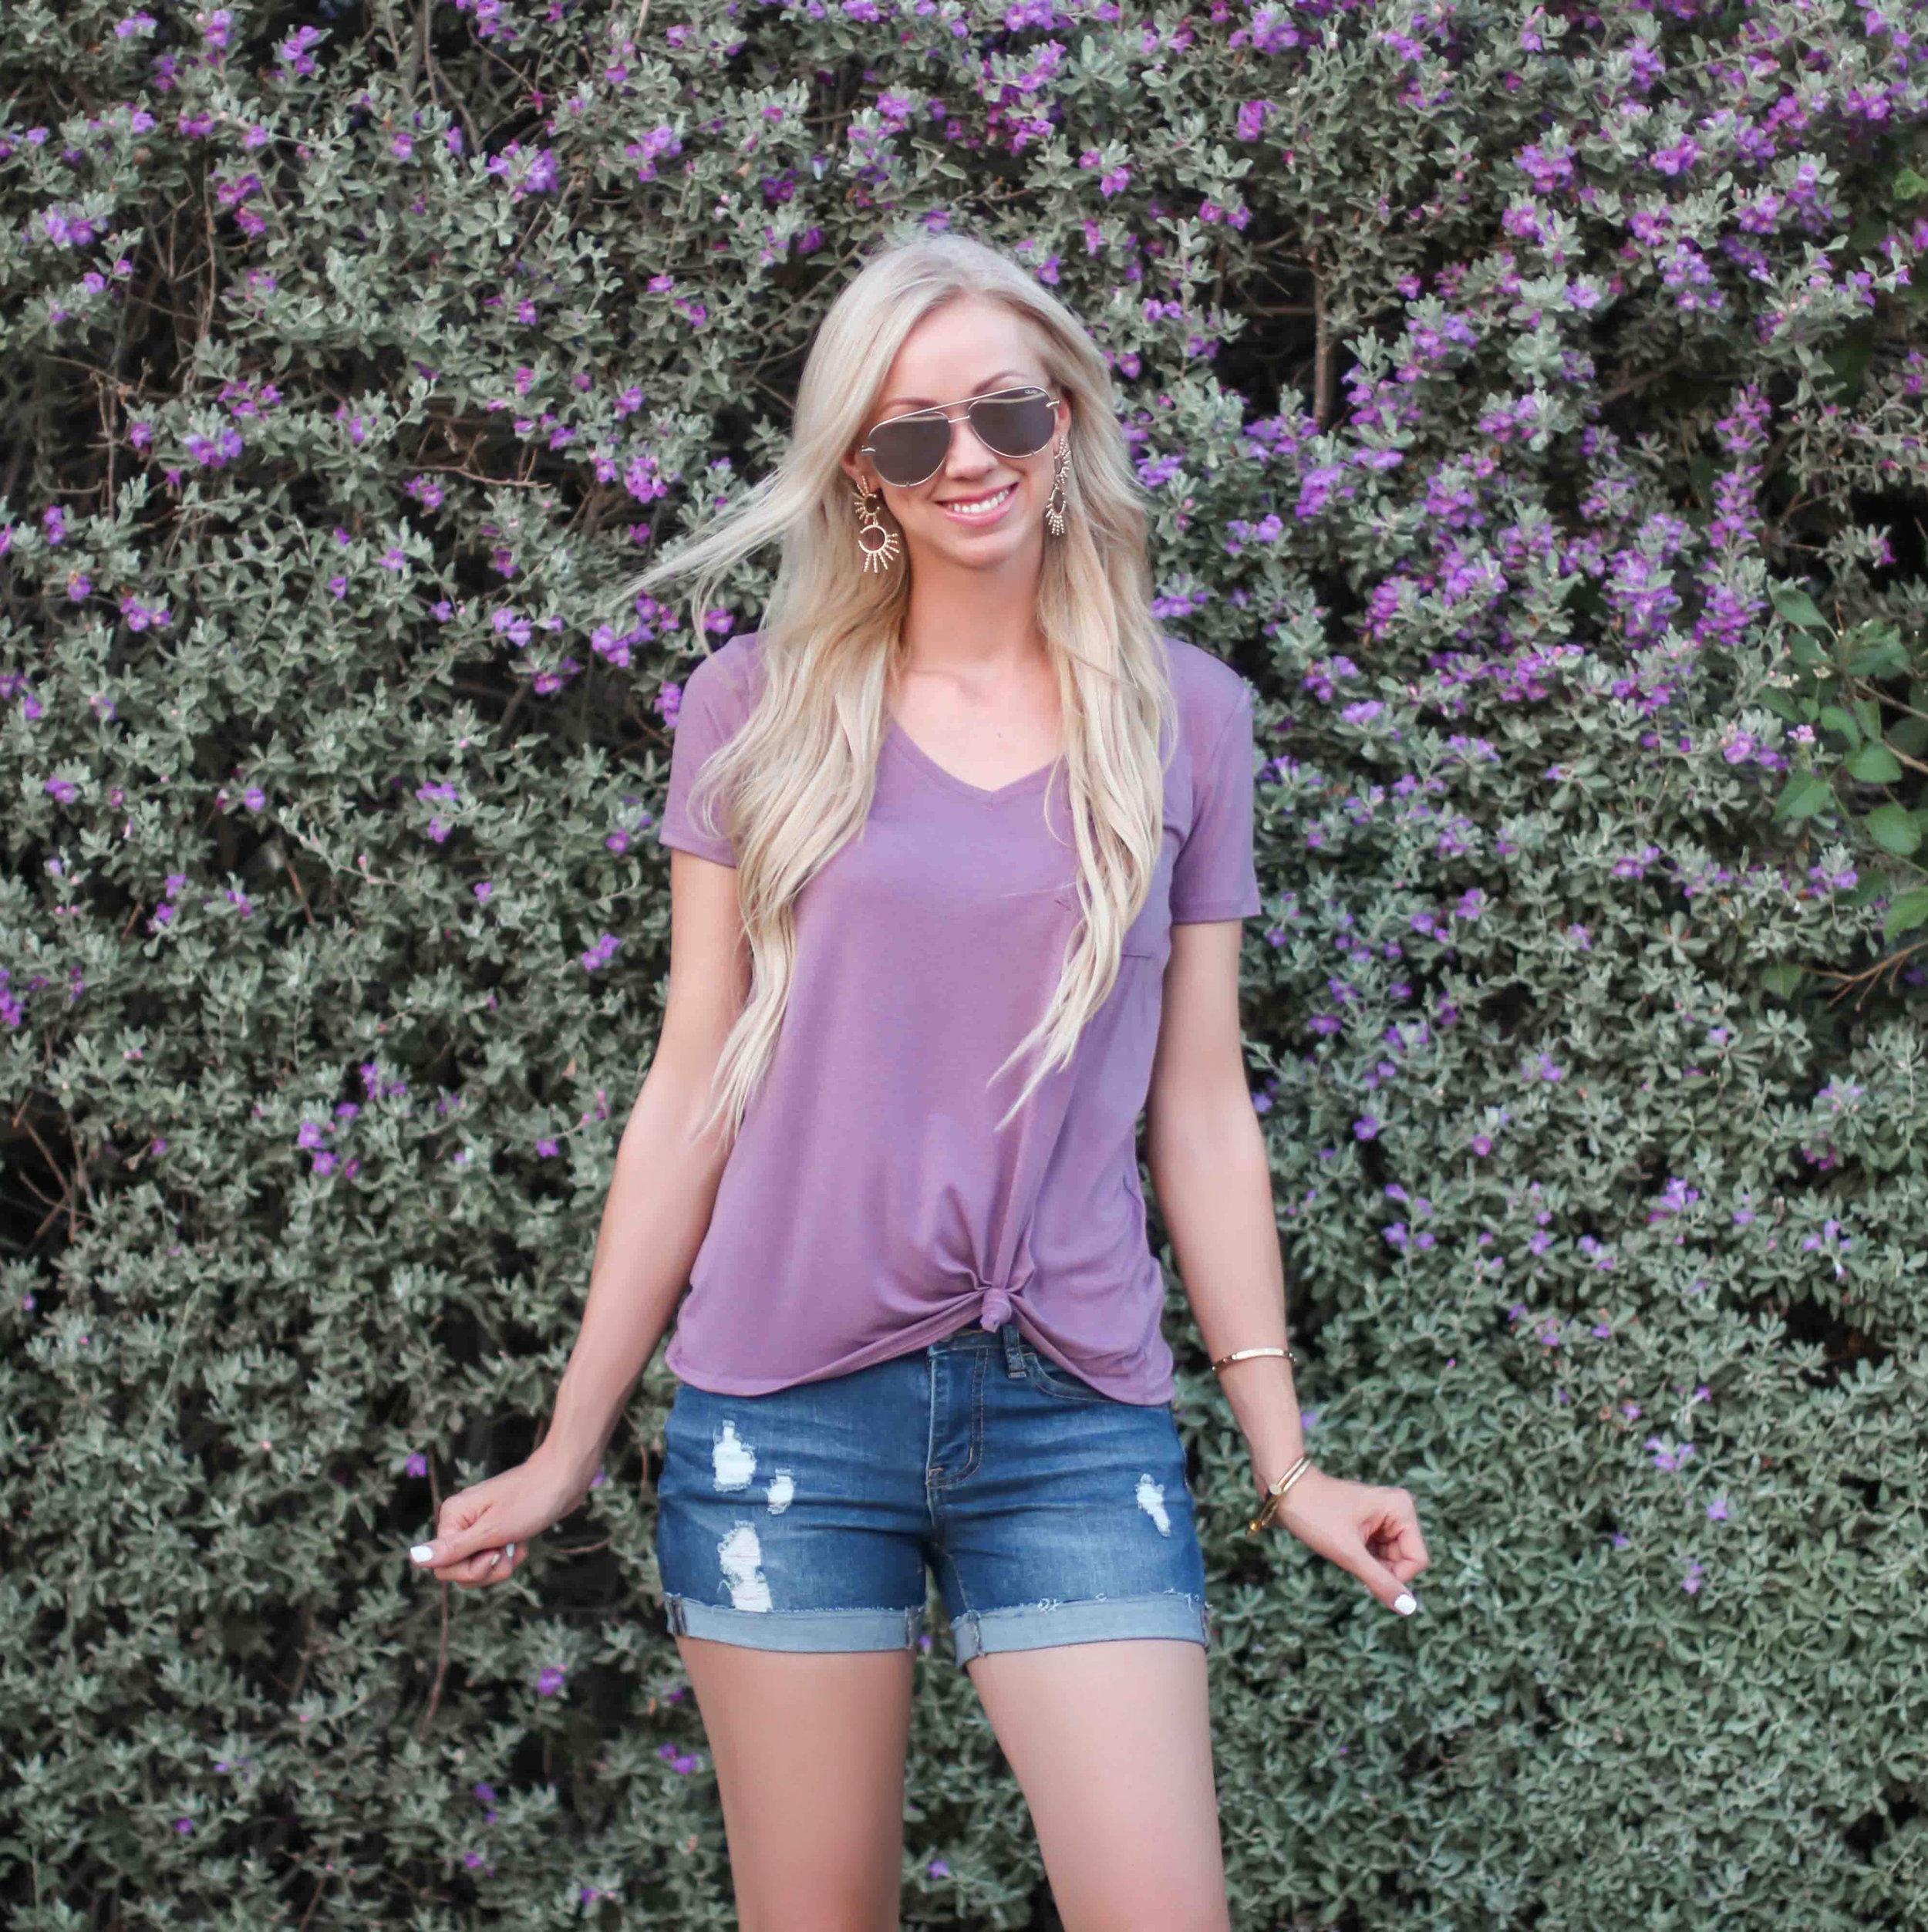 kohls-so-pocket-tee-tie-front-knot-purple-summer-fashion.jpg